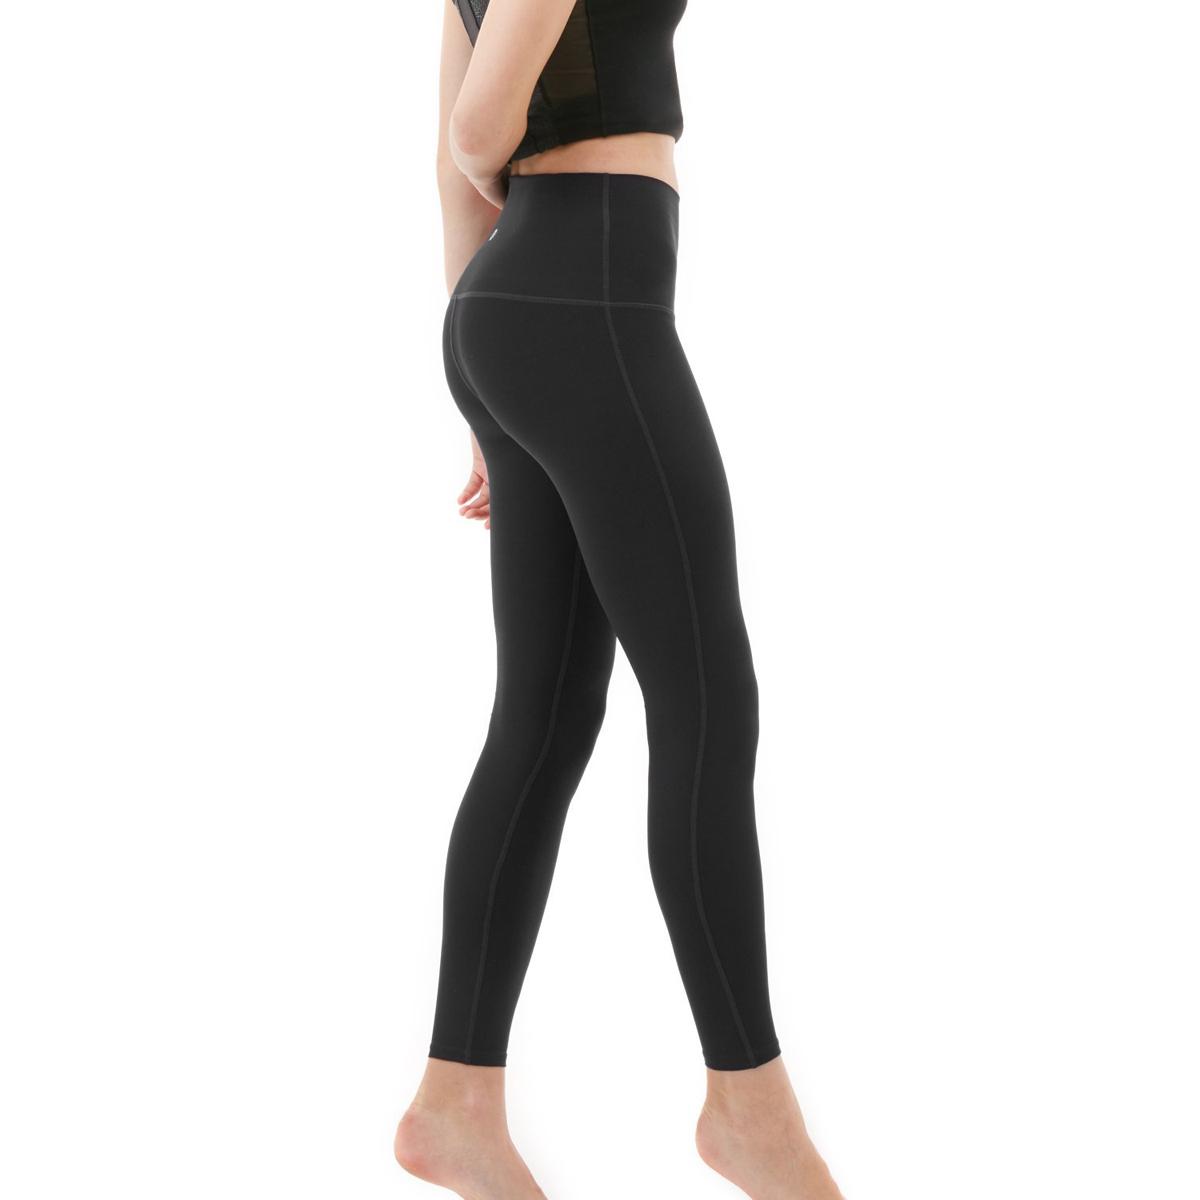 thumbnail 24 - TSLA Tesla FYP42 Women's High-Waisted Ultra-Stretch Tummy Control Yoga Pants